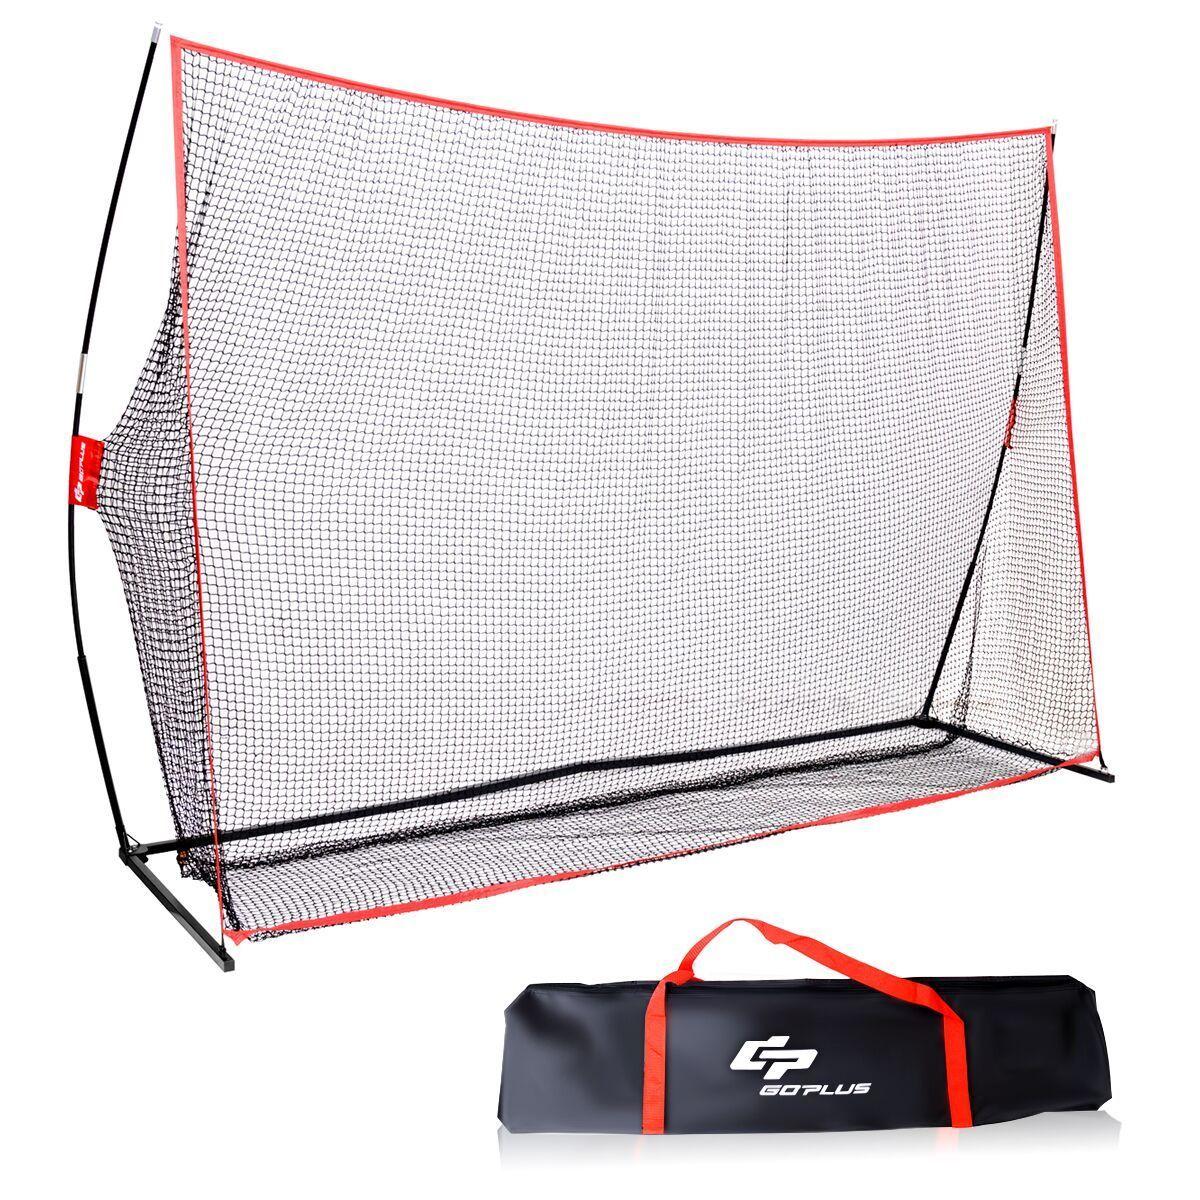 Goplus 10'x7' Golf Practice Net Training Hitting Personal